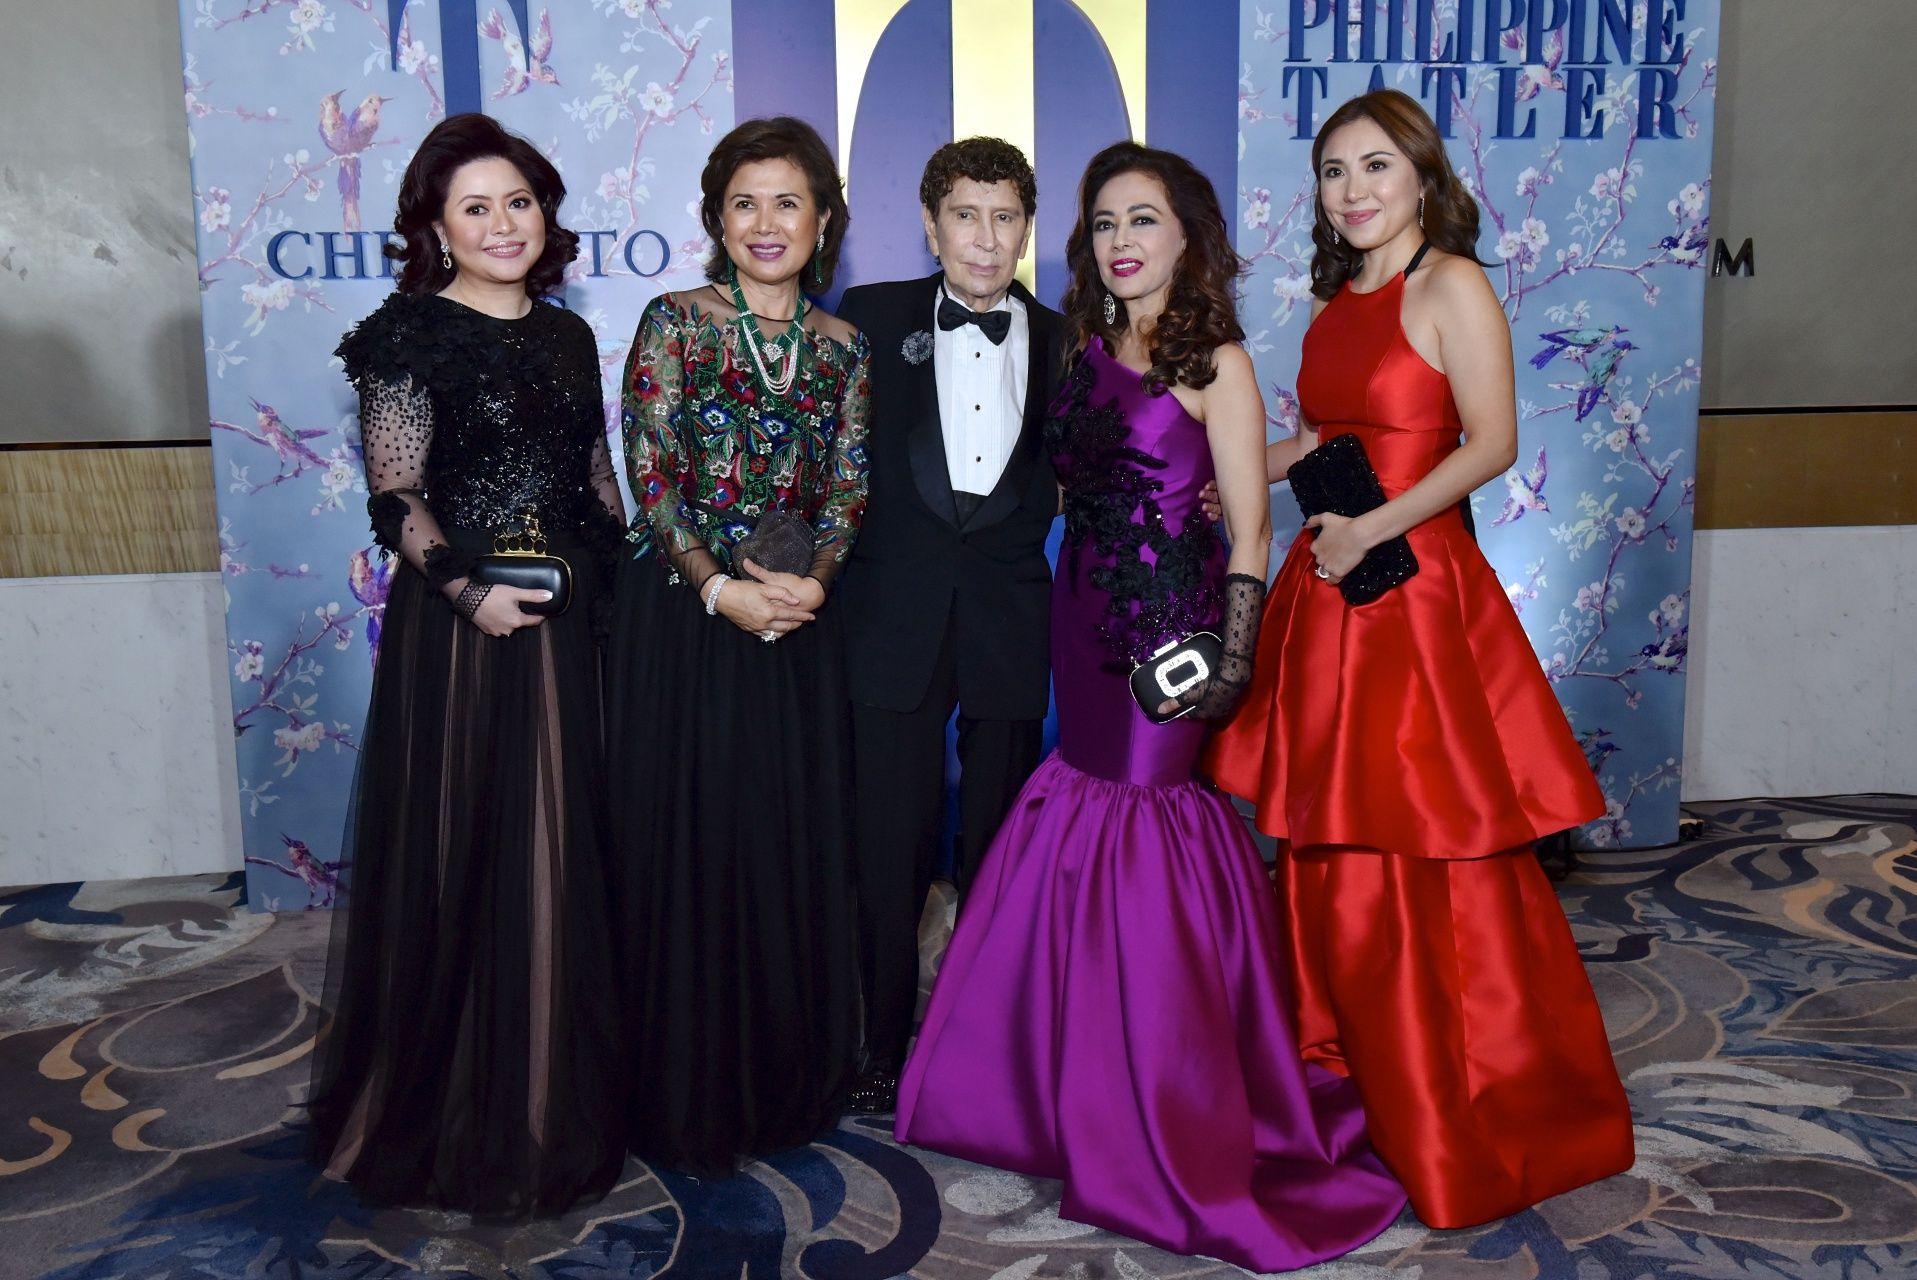 Carla Del Prado, Mariquita Yeung, Maurice Arcache, Mayenne Carmona and Carla Mckowen